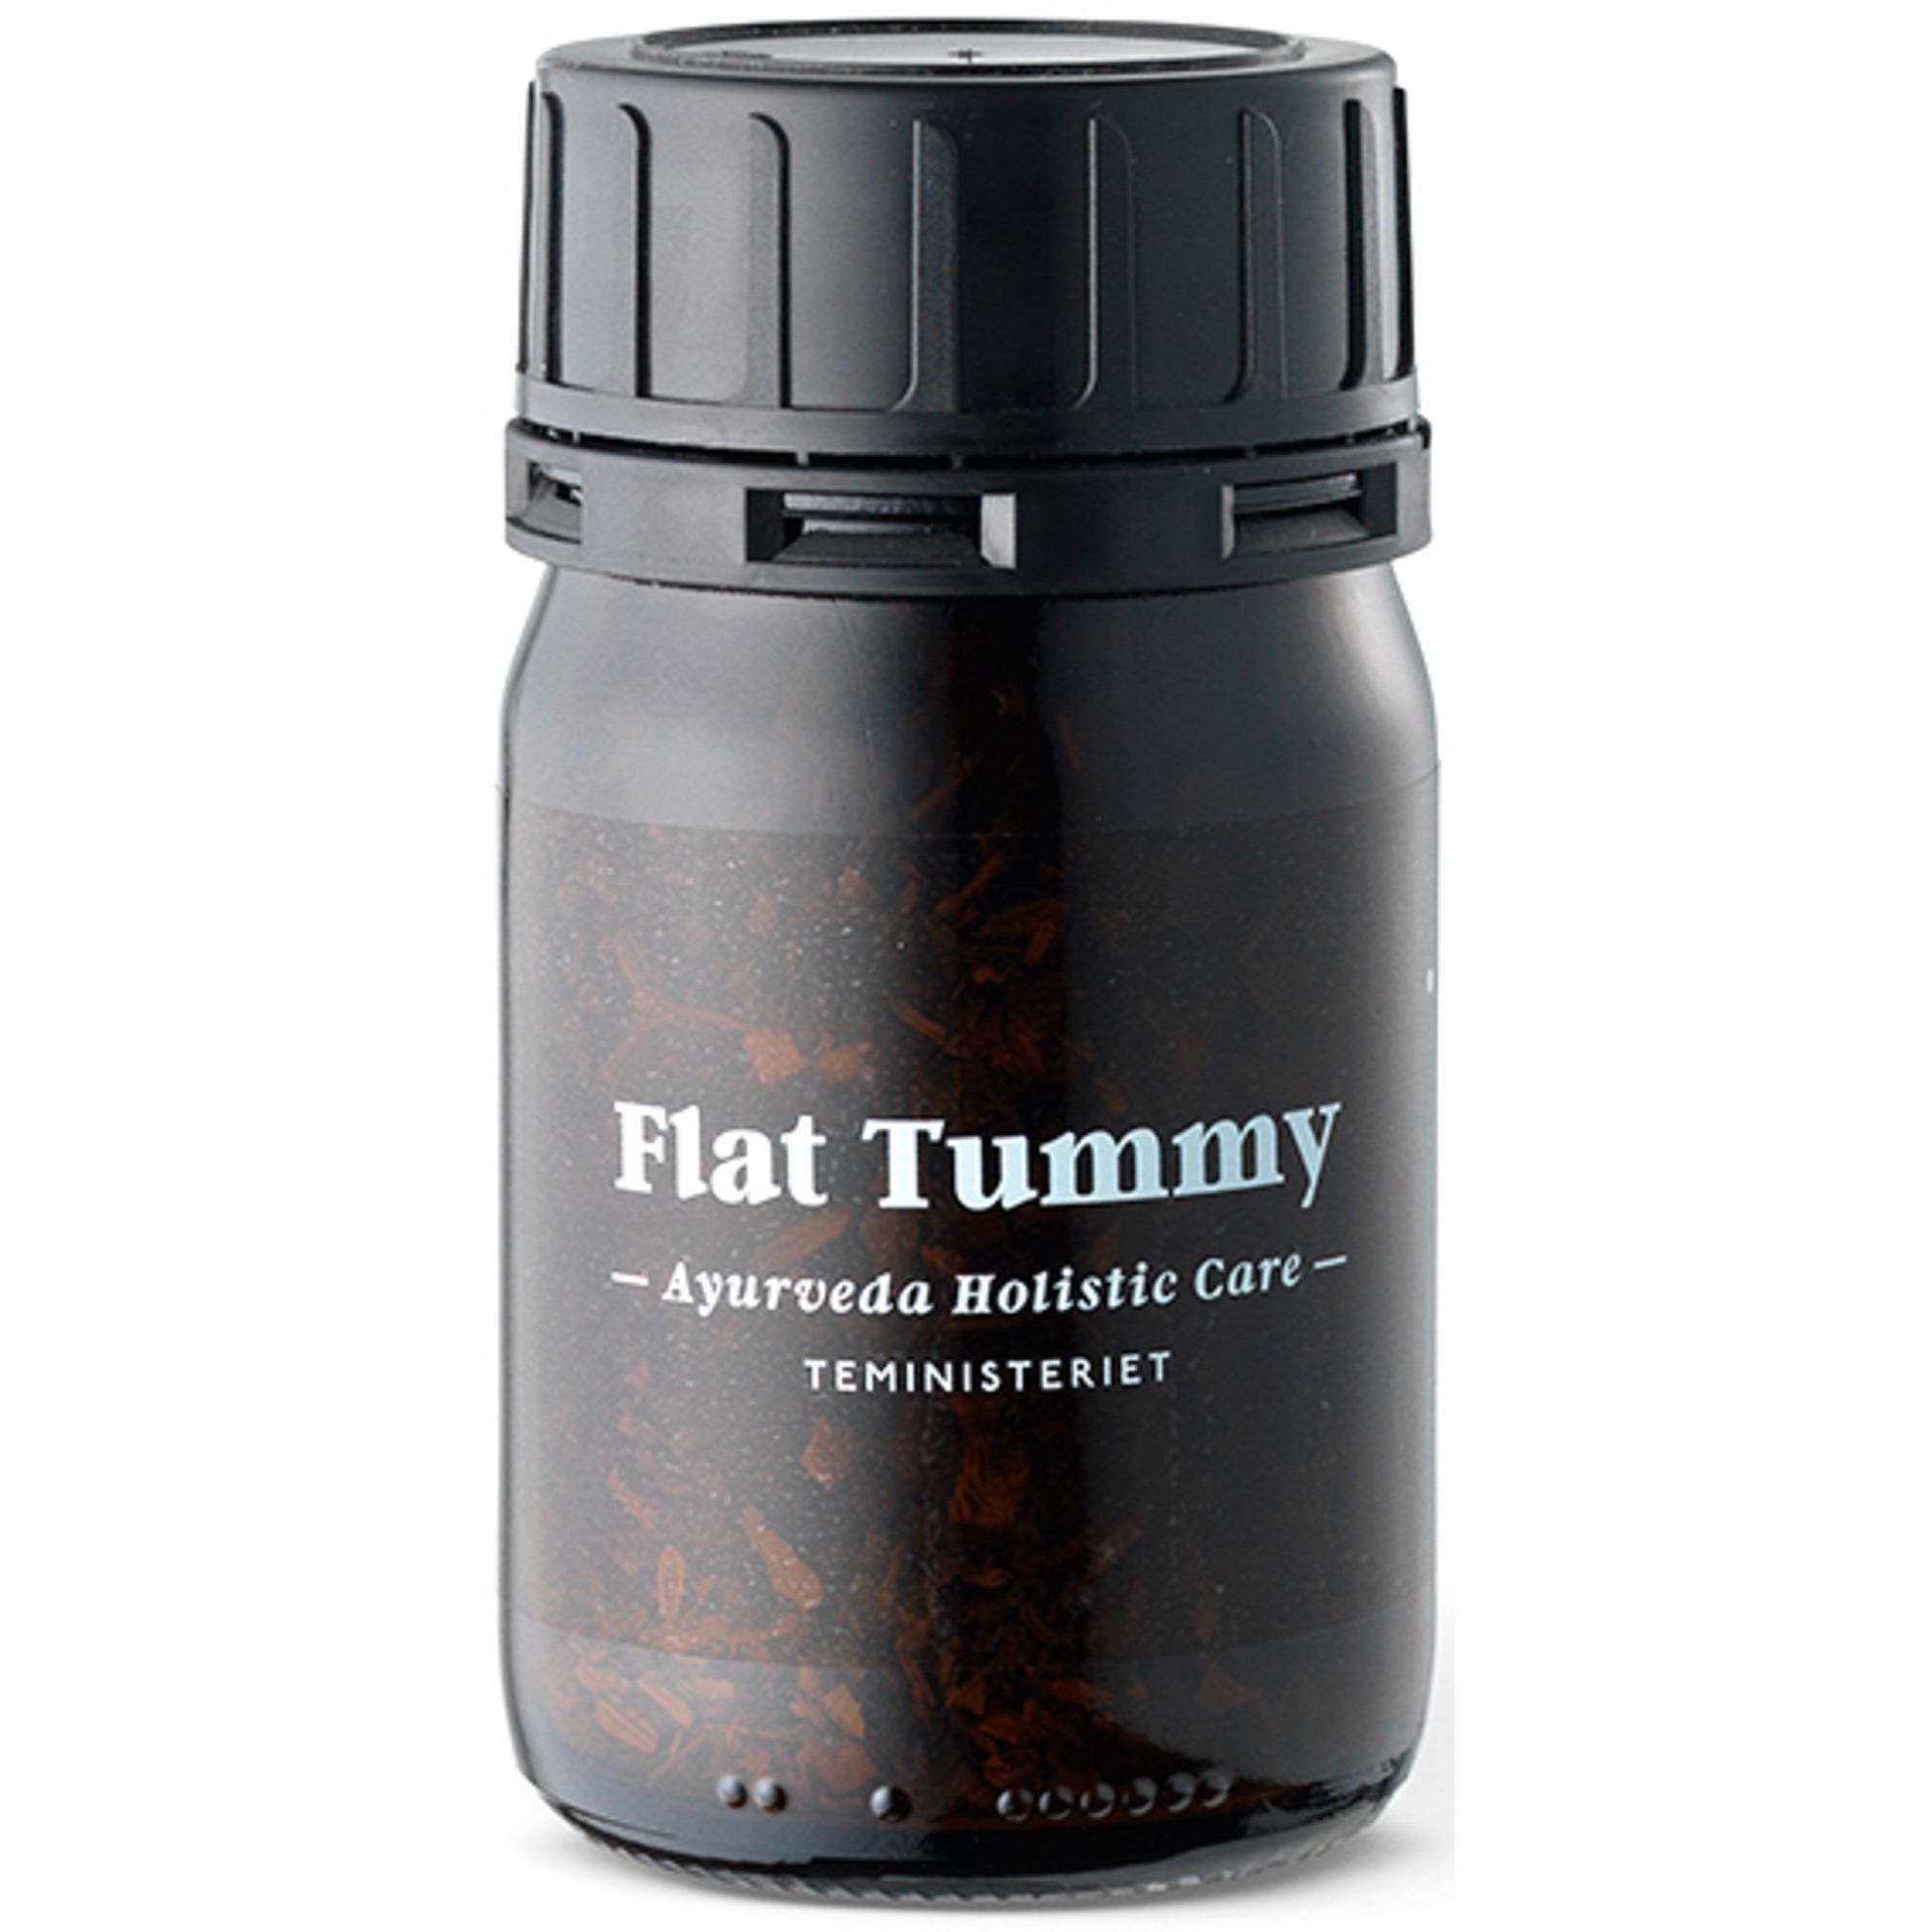 Teministeriet Ayurveda Flat Tummy te